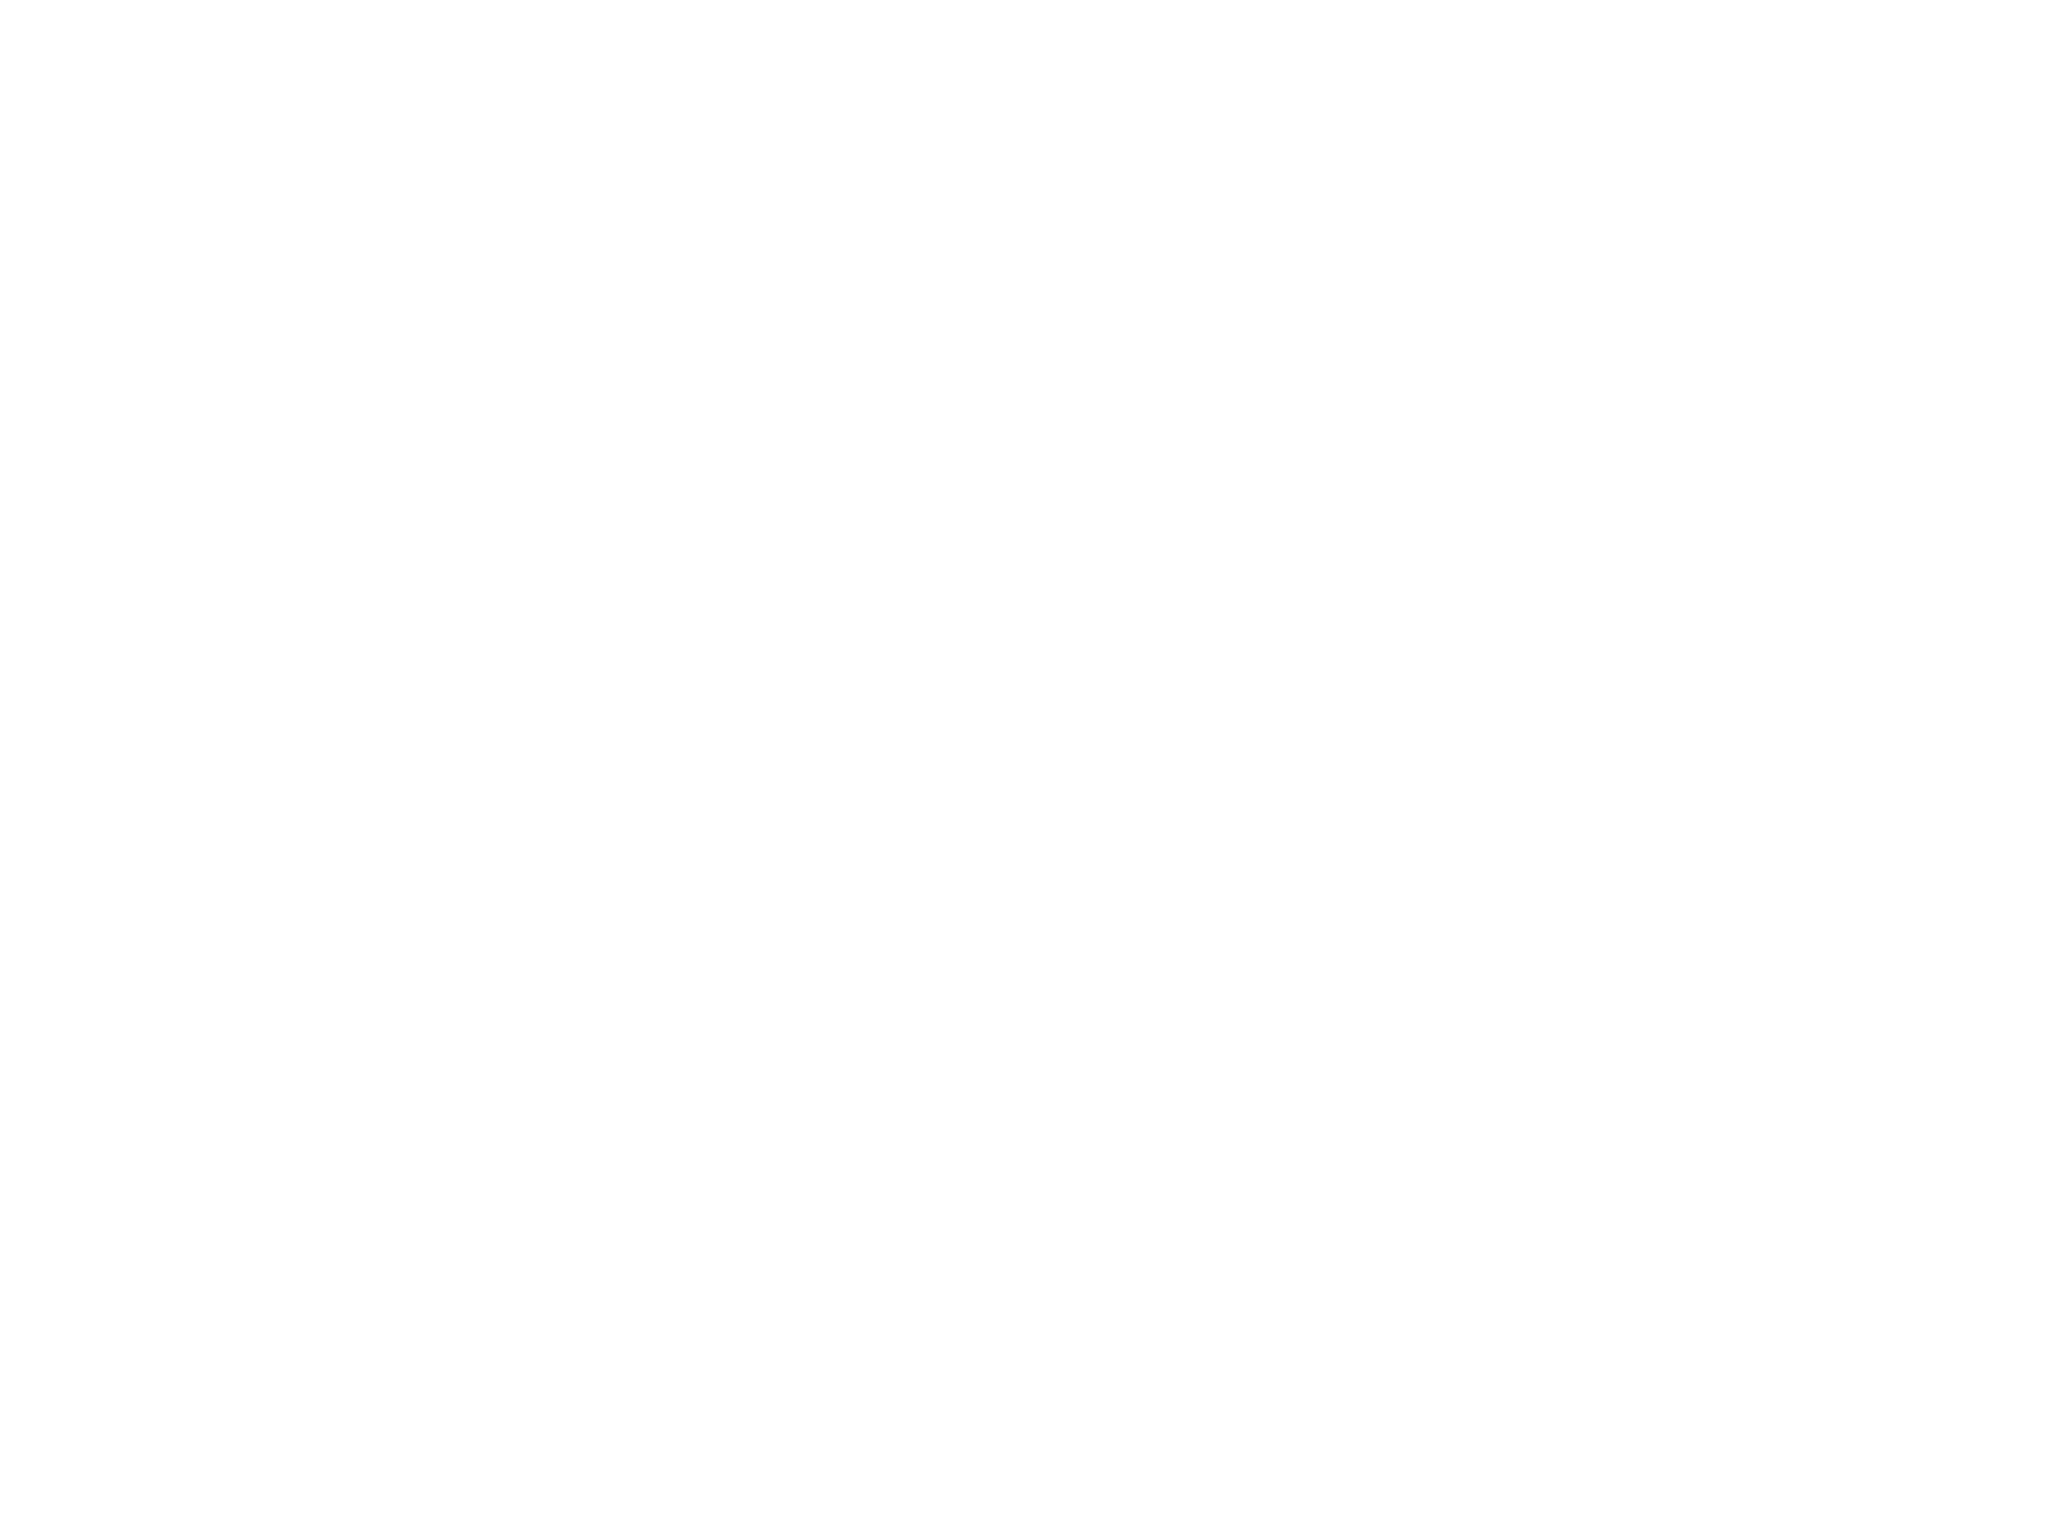 League of Social Entrepreneurs